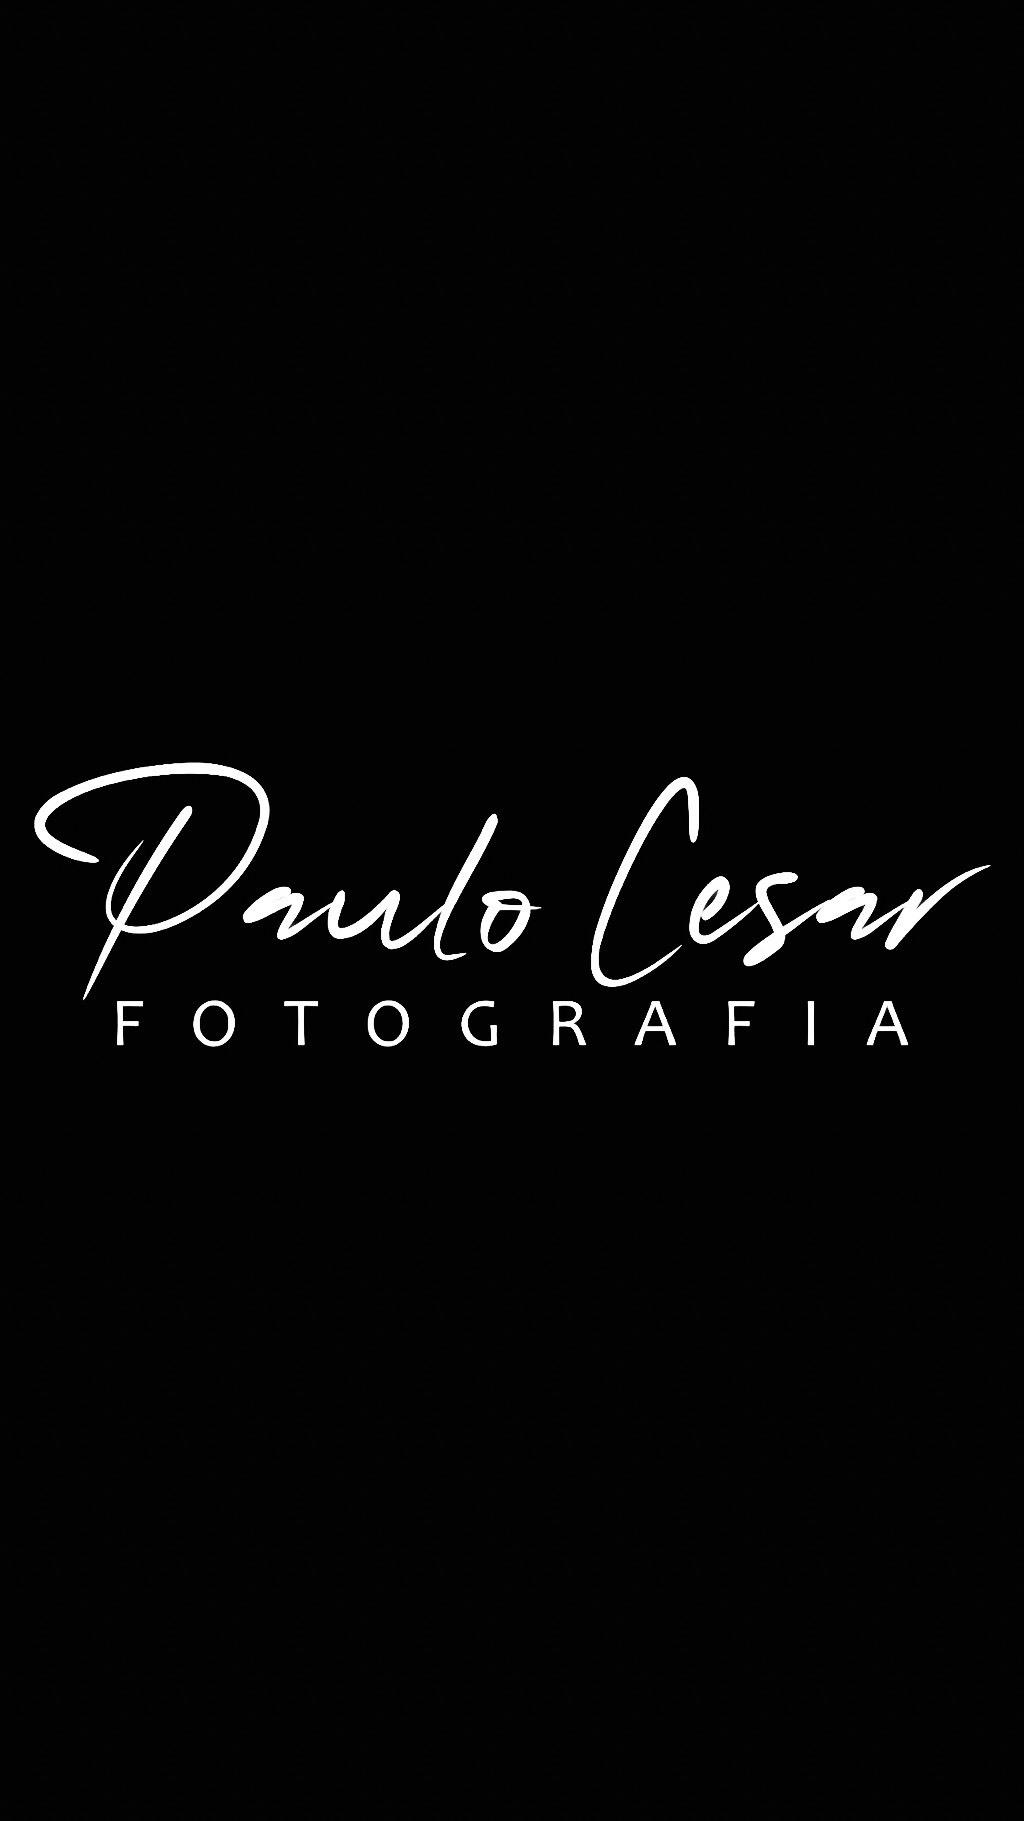 Sobre Paulo Cesar Fotografia